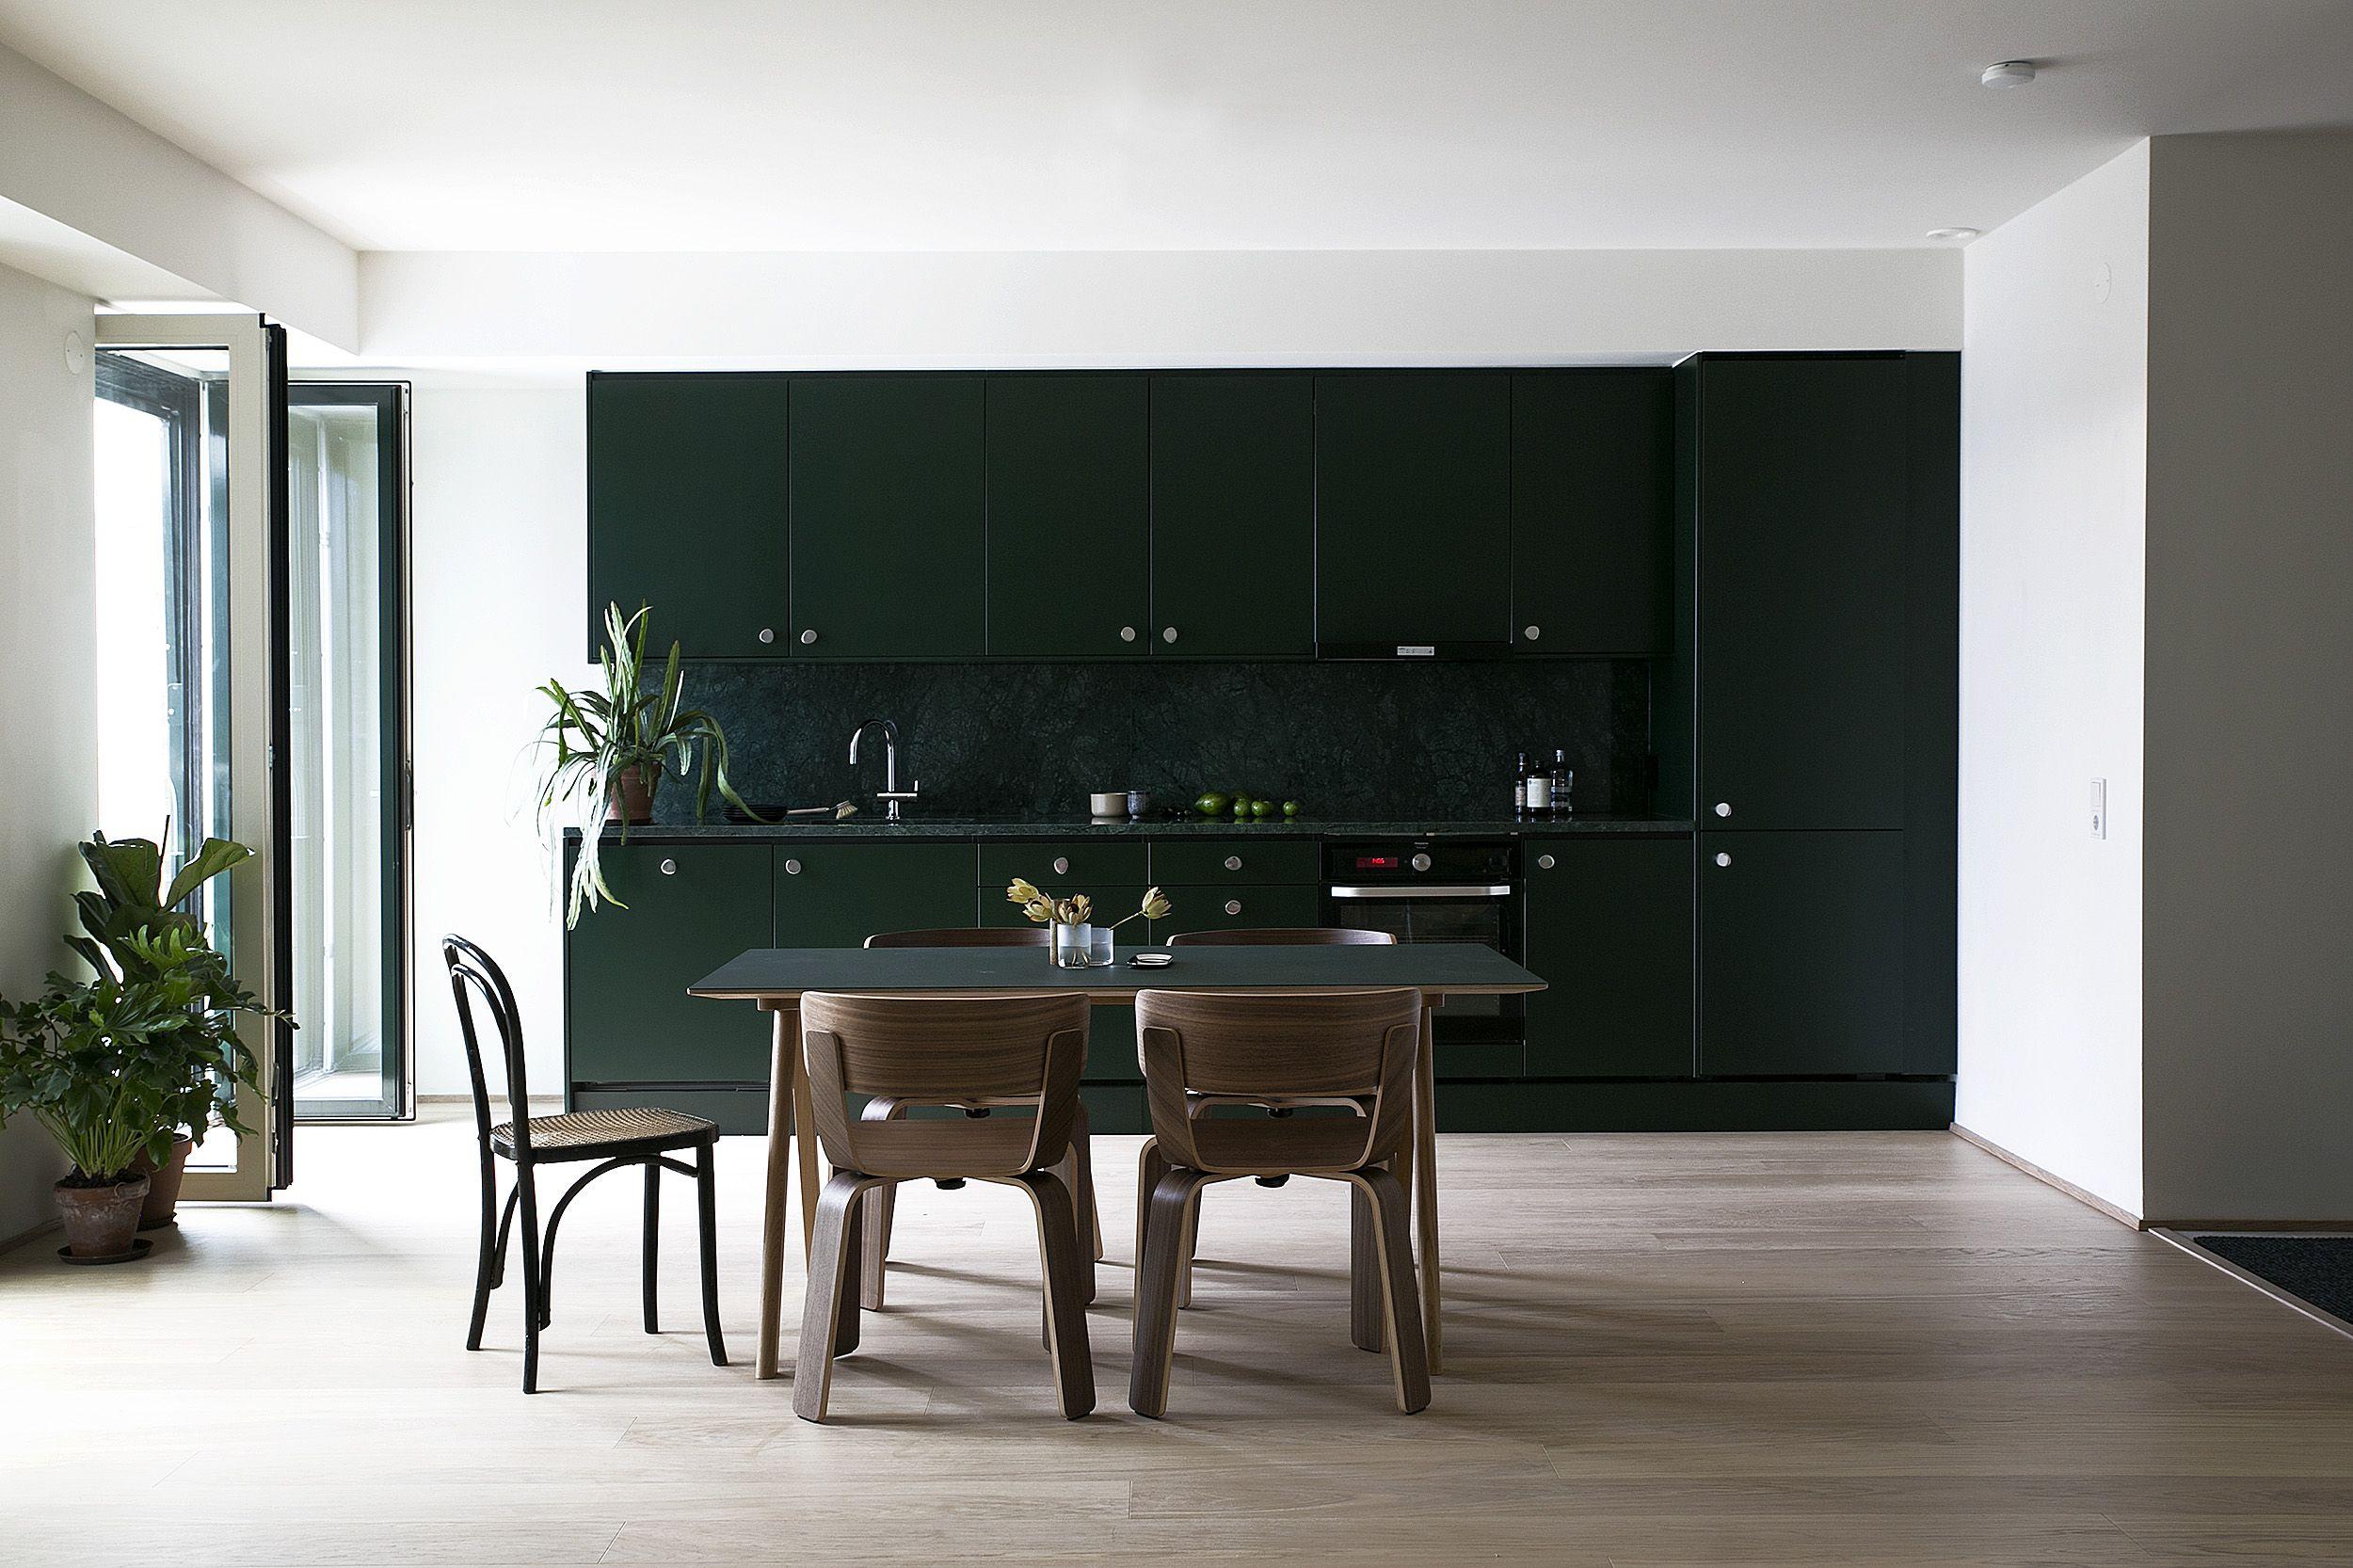 45 Kitchen Cabinet Design Ideas 2019 - Unique Kitchen